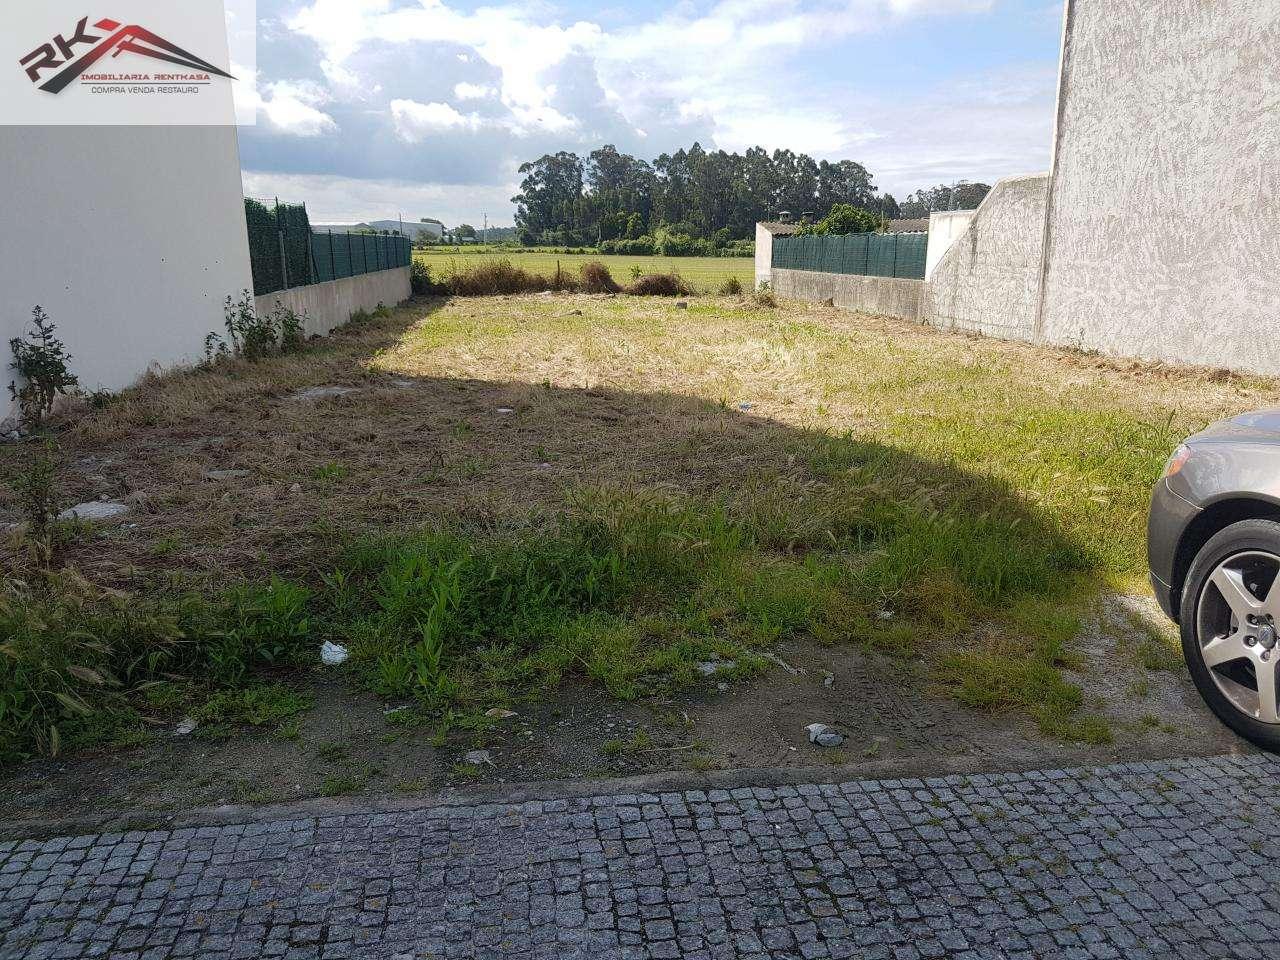 Terreno para comprar, Póvoa de Varzim, Beiriz e Argivai, Porto - Foto 1